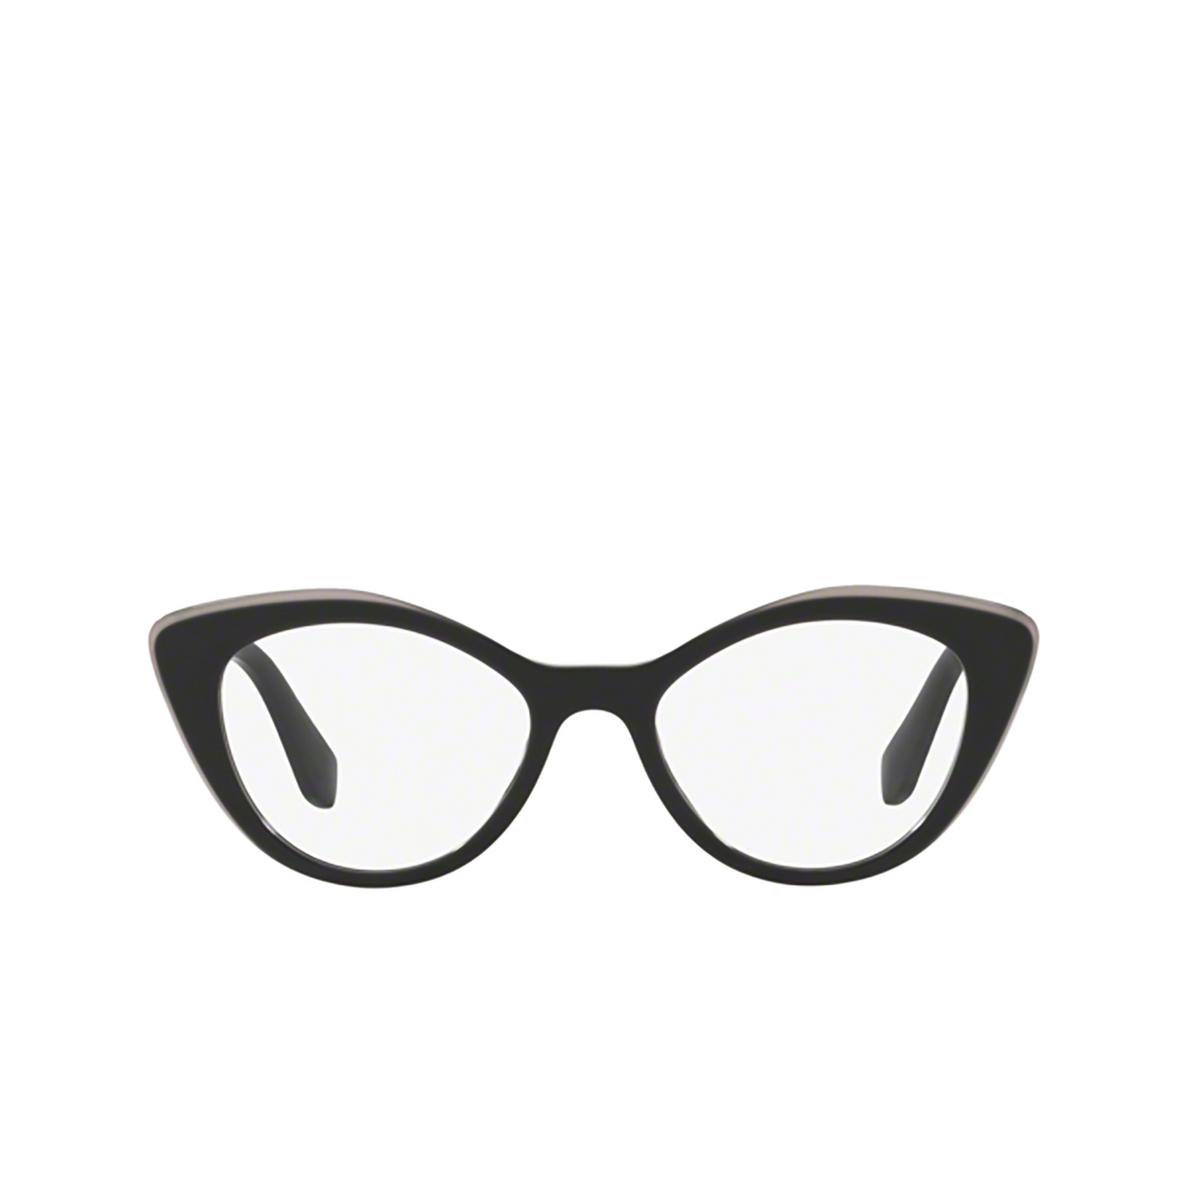 Miu Miu® Cat-eye Eyeglasses: MU 01RV color Black Top Grey K9T1O1 - front view.